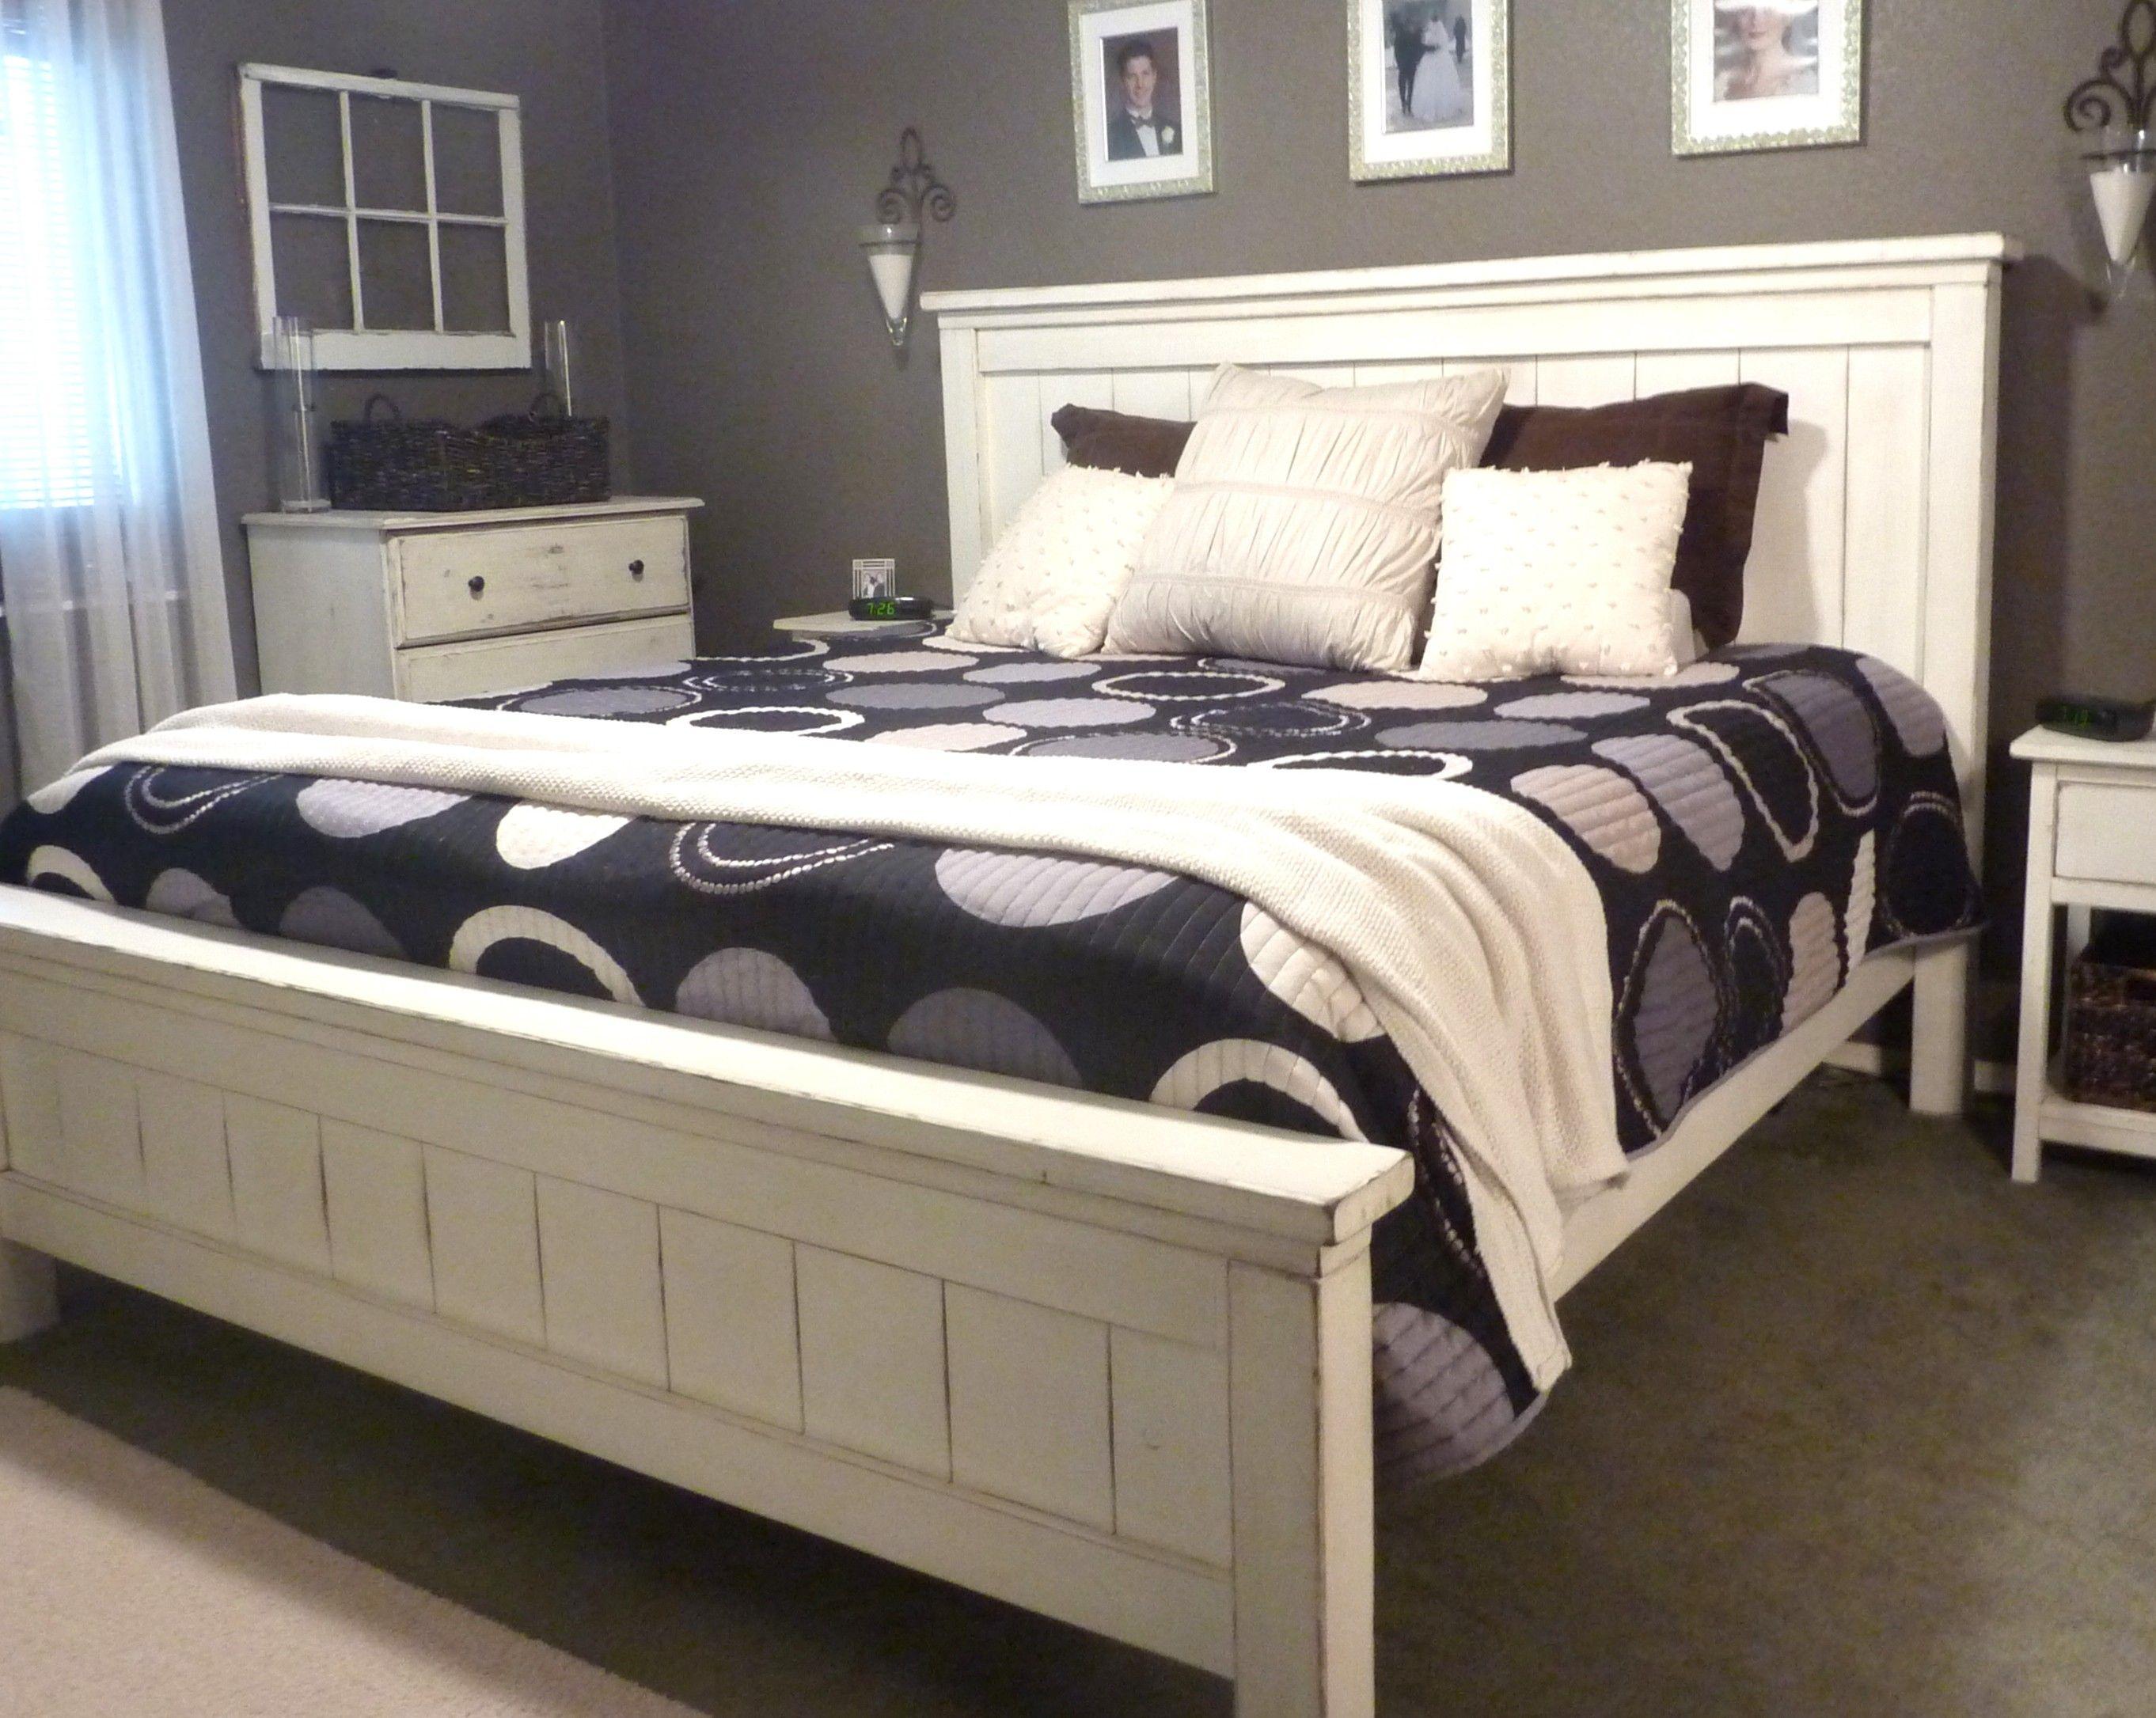 Fabulous elegant eastern king size bed ideas for master